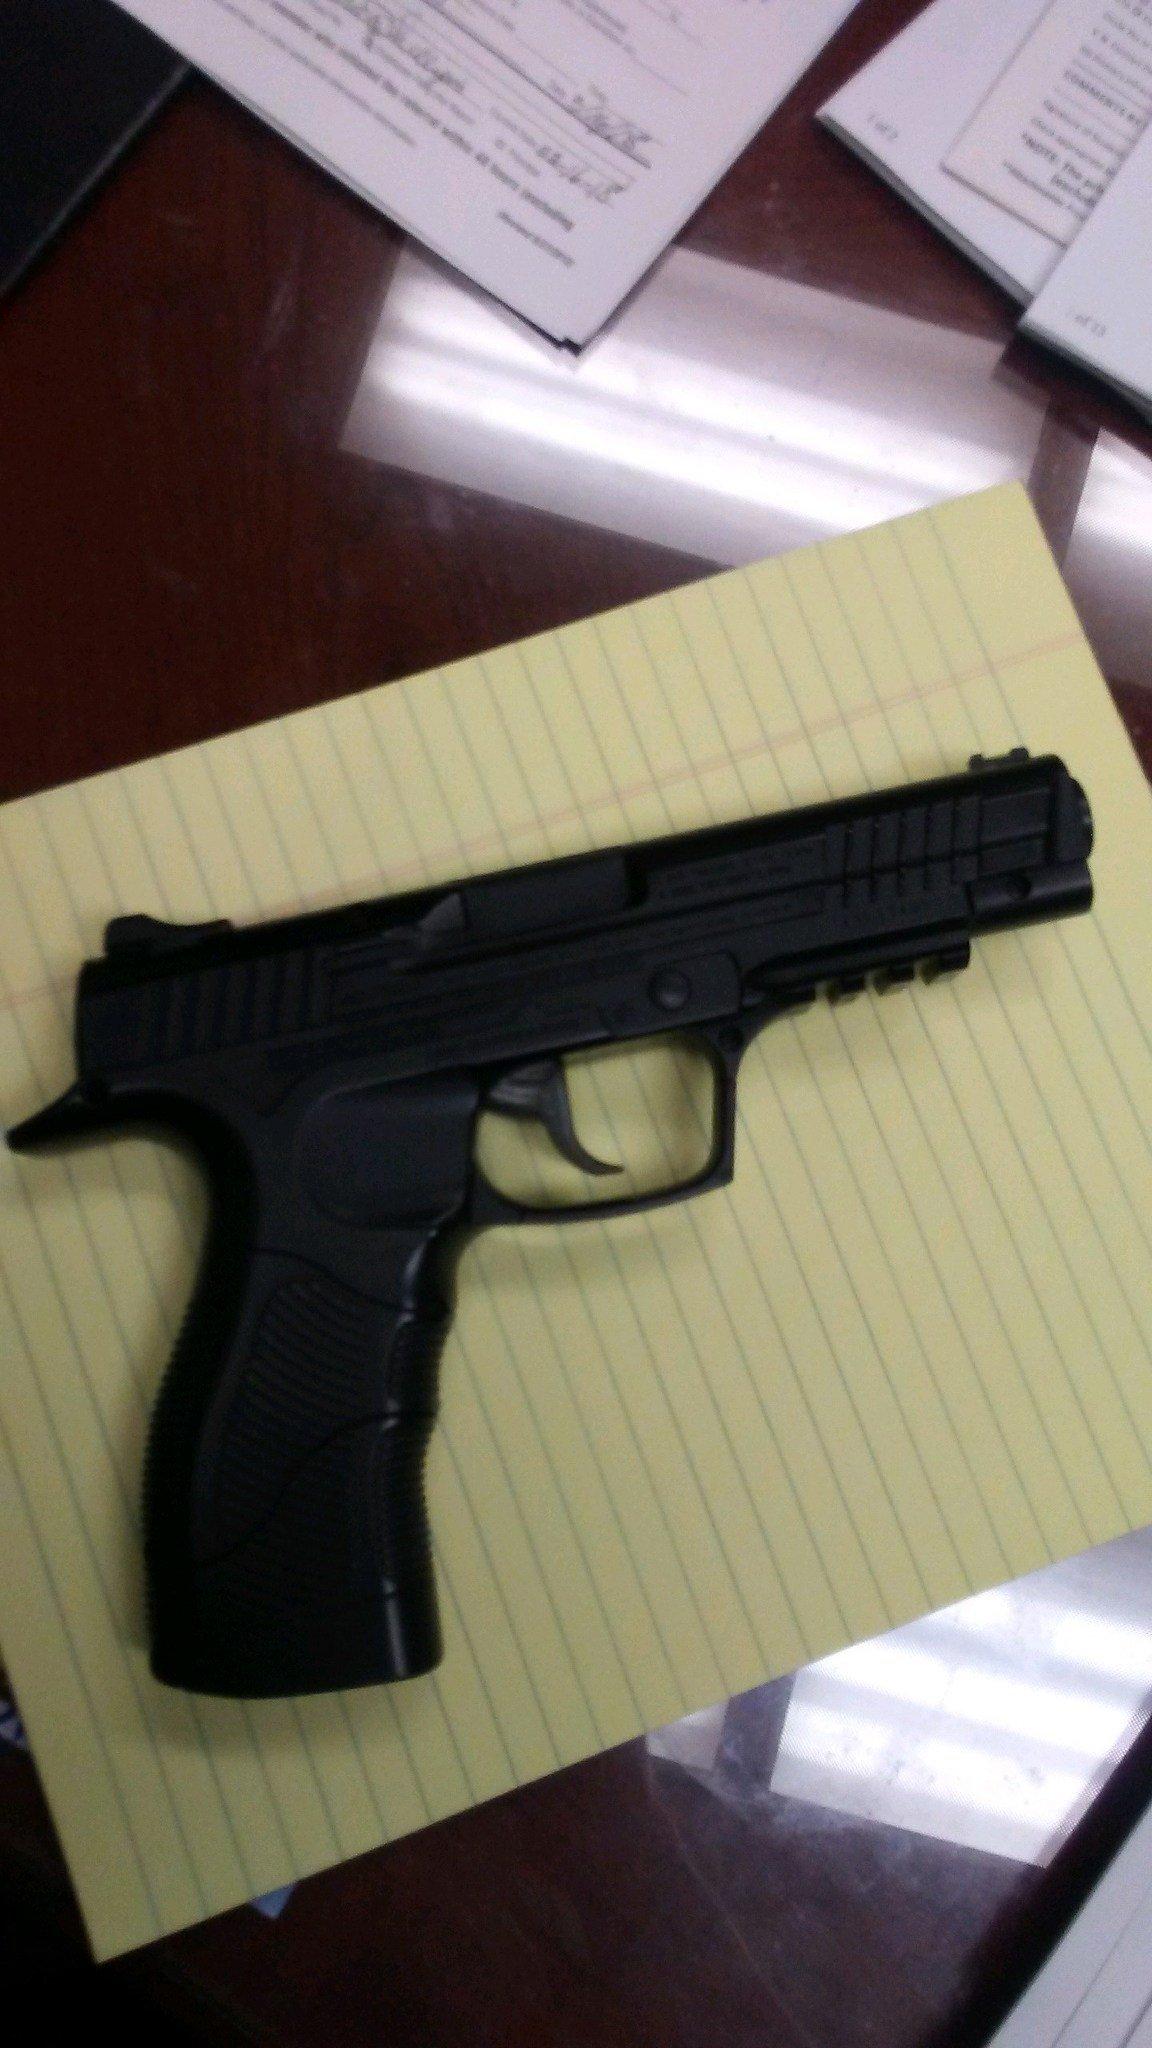 Pellet gun found in backpack (PHOTO: RPSO)